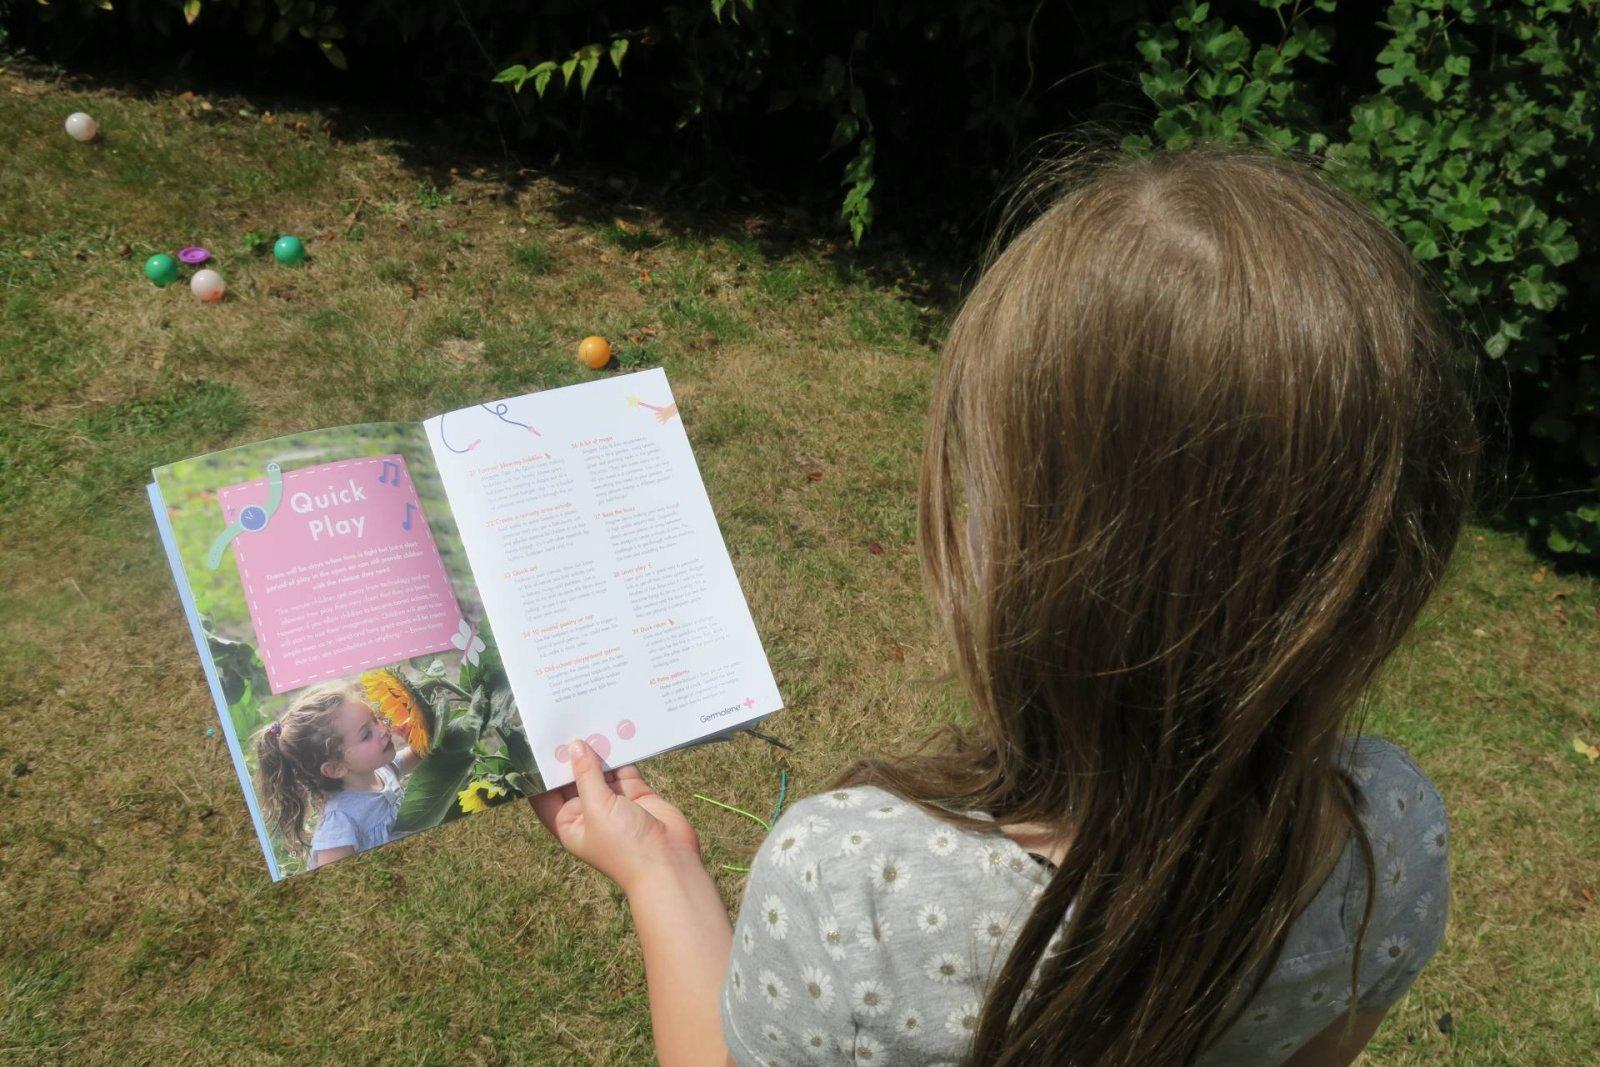 90-days-summer-ideas-outdoor-play-cheap-free